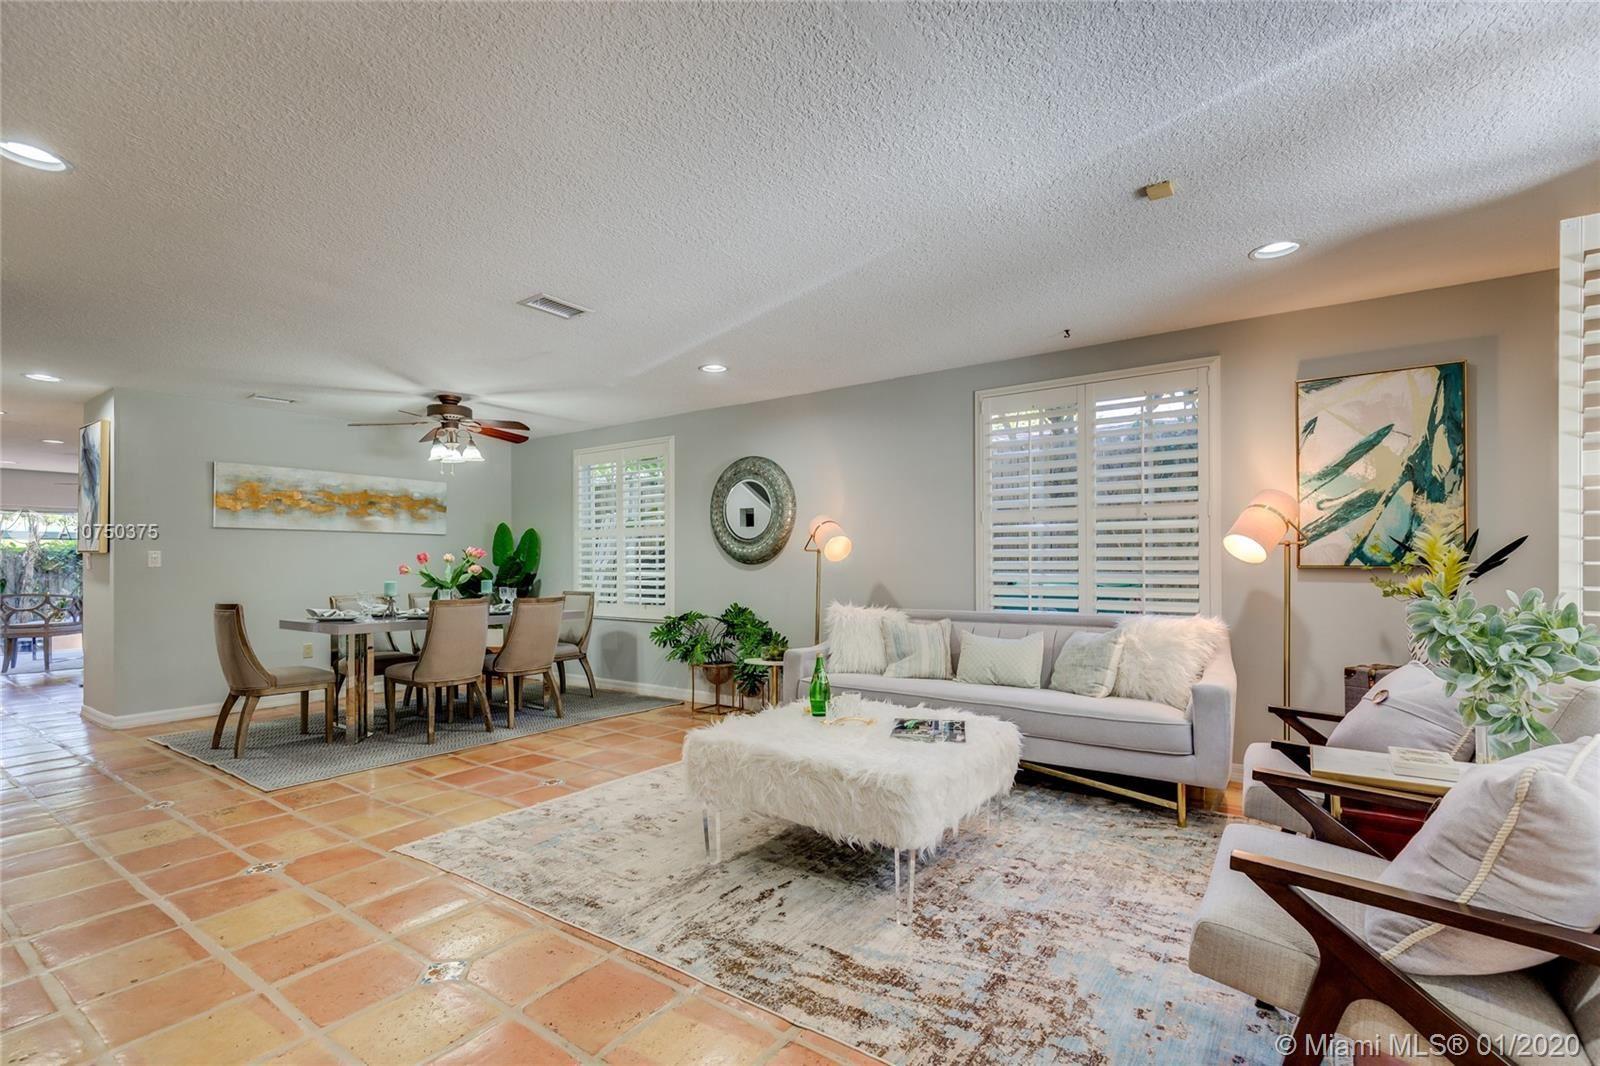 3274 Gifford Ln #A, Coconut Grove, FL 33133 - MLS#: A10750375